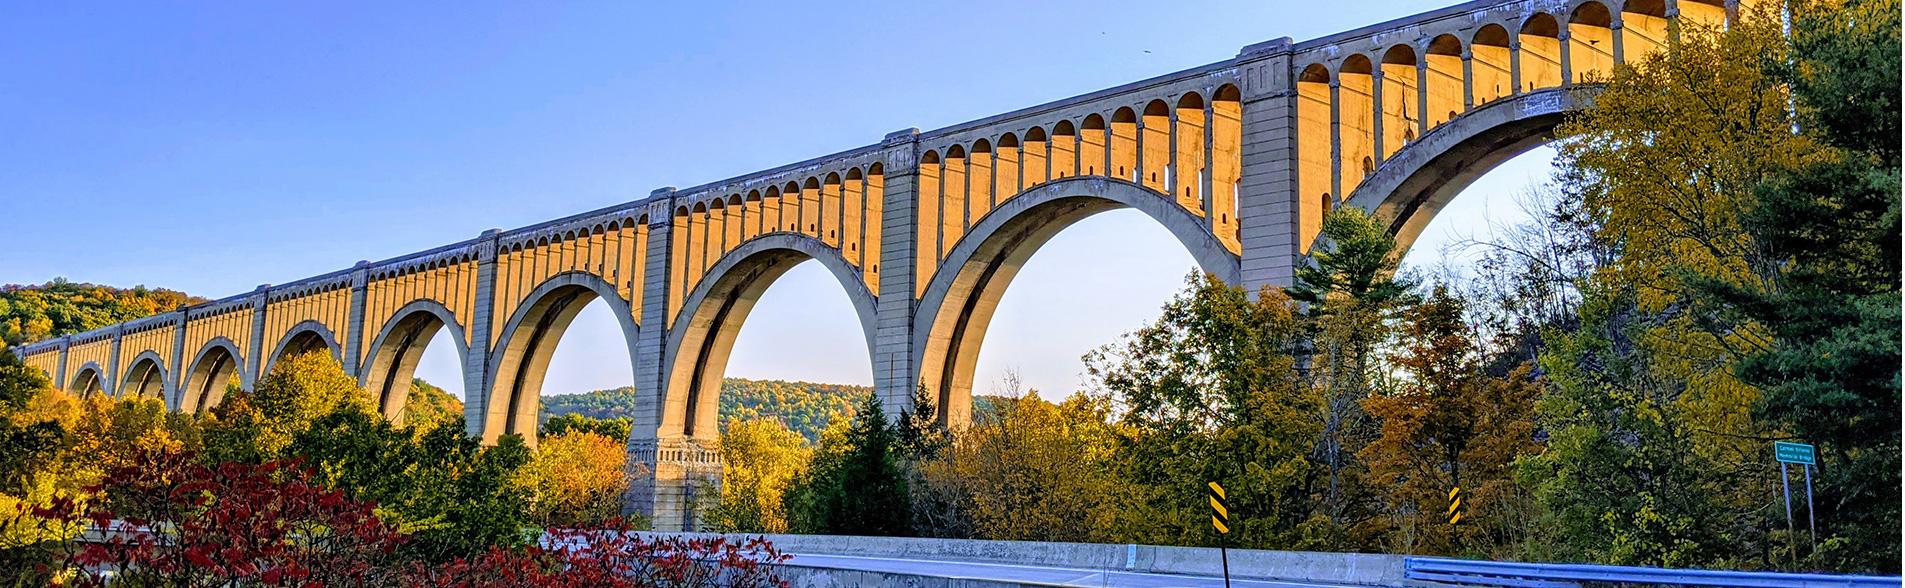 Tunkhannock Viaduct (Nicholson Bridge)